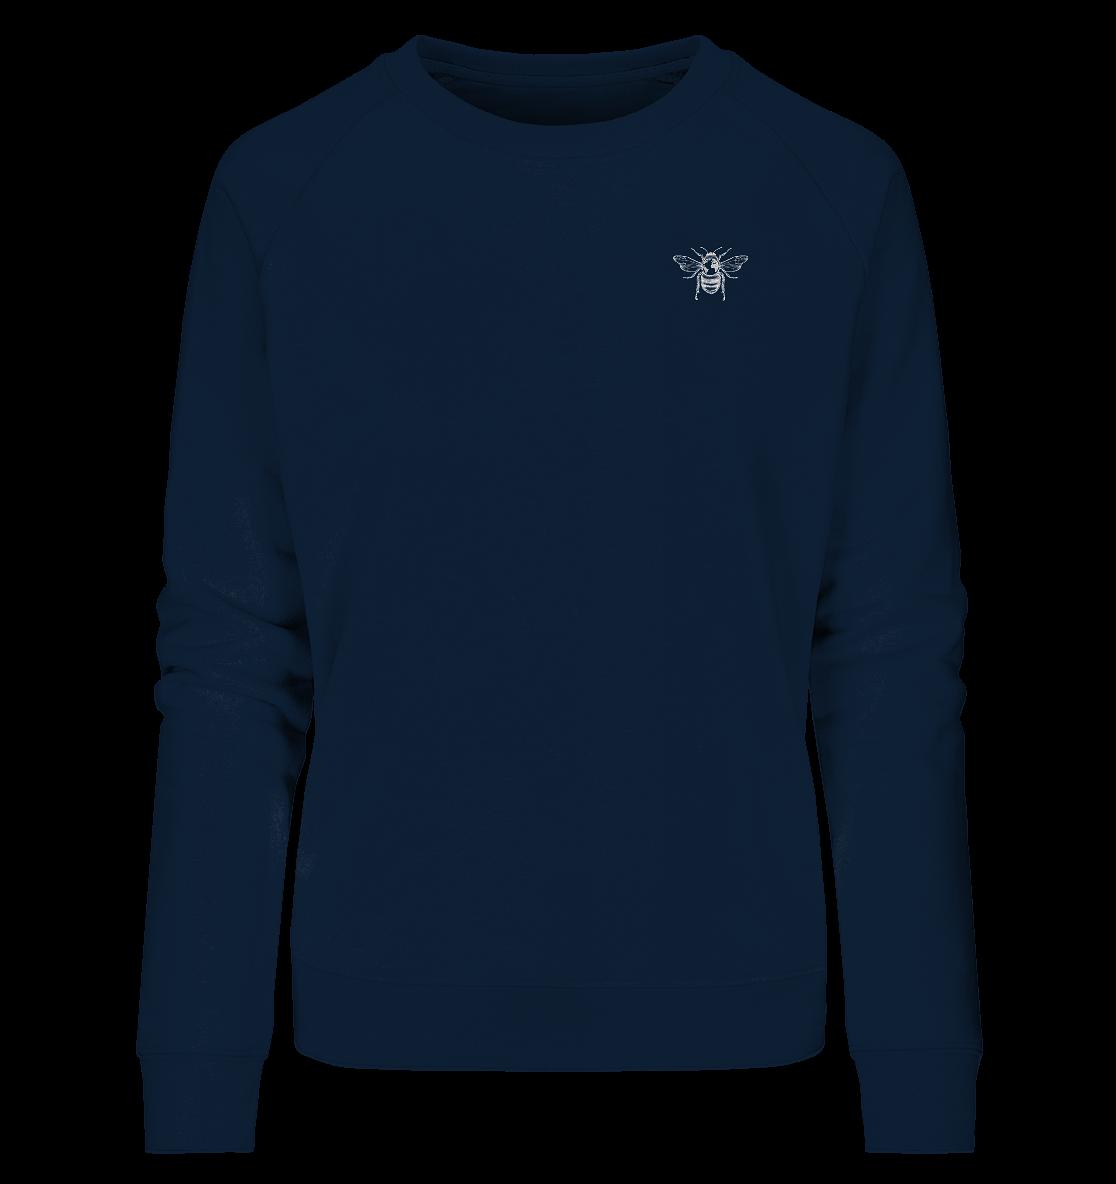 front-ladies-organic-sweatshirt-0e2035-1116x.png